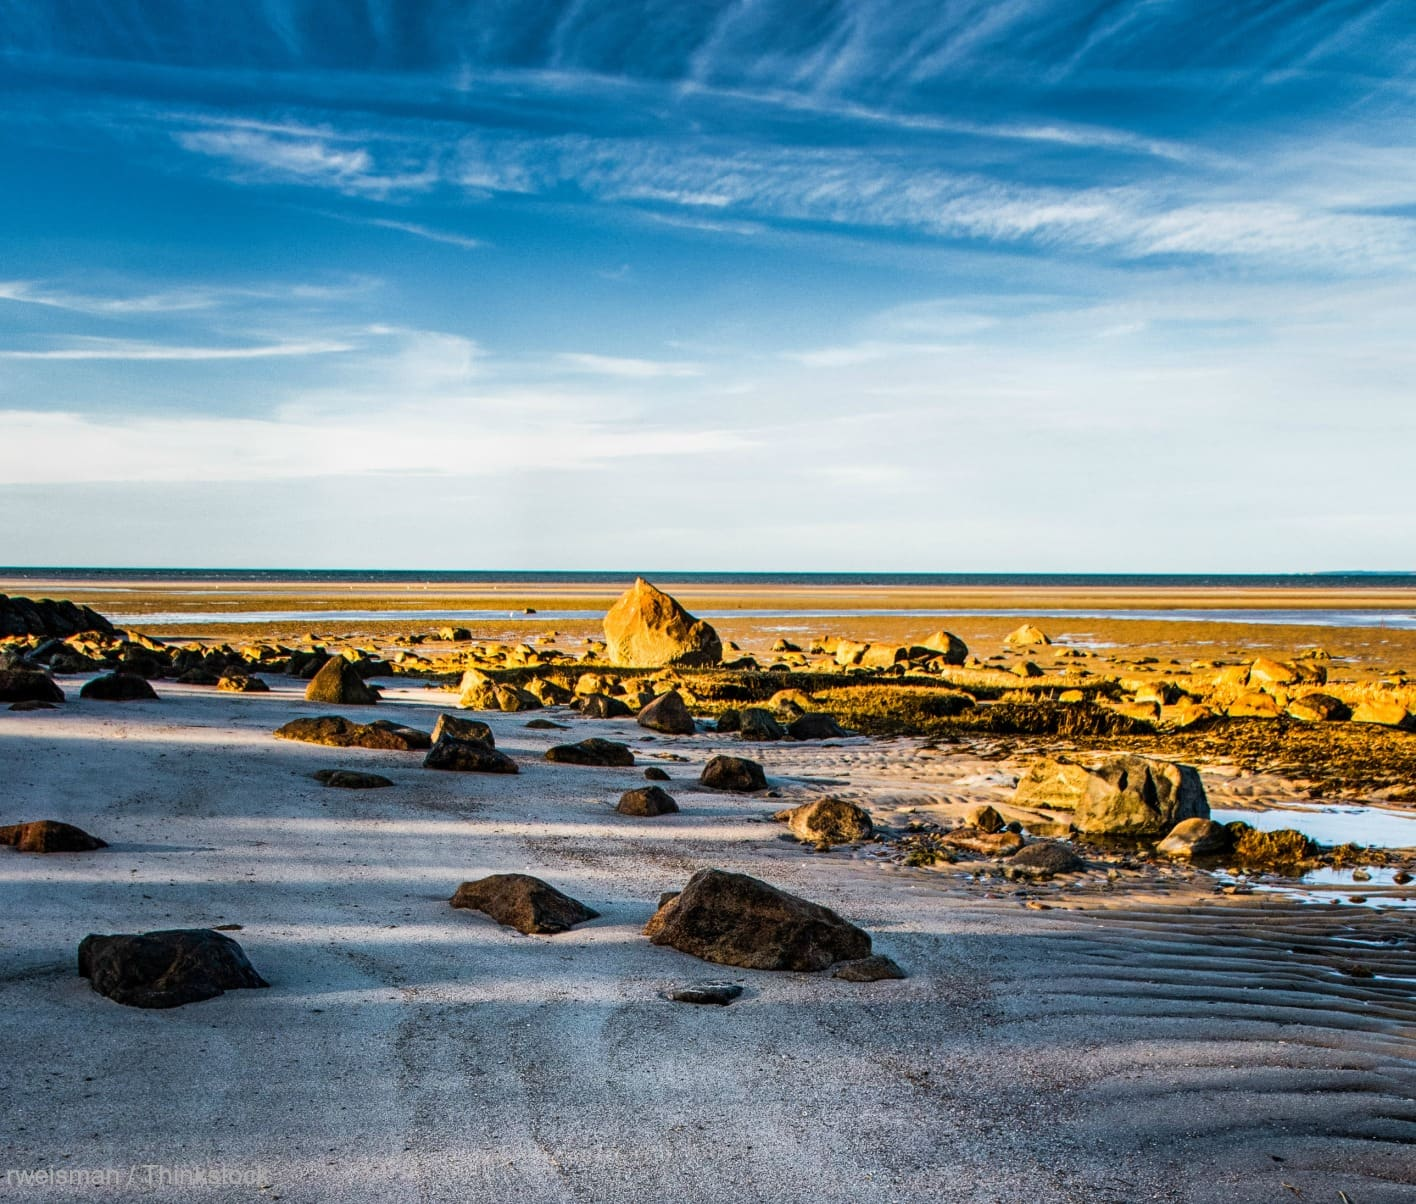 Hotels In Cape Cod On Beach: Brewster Flats In Massachusetts